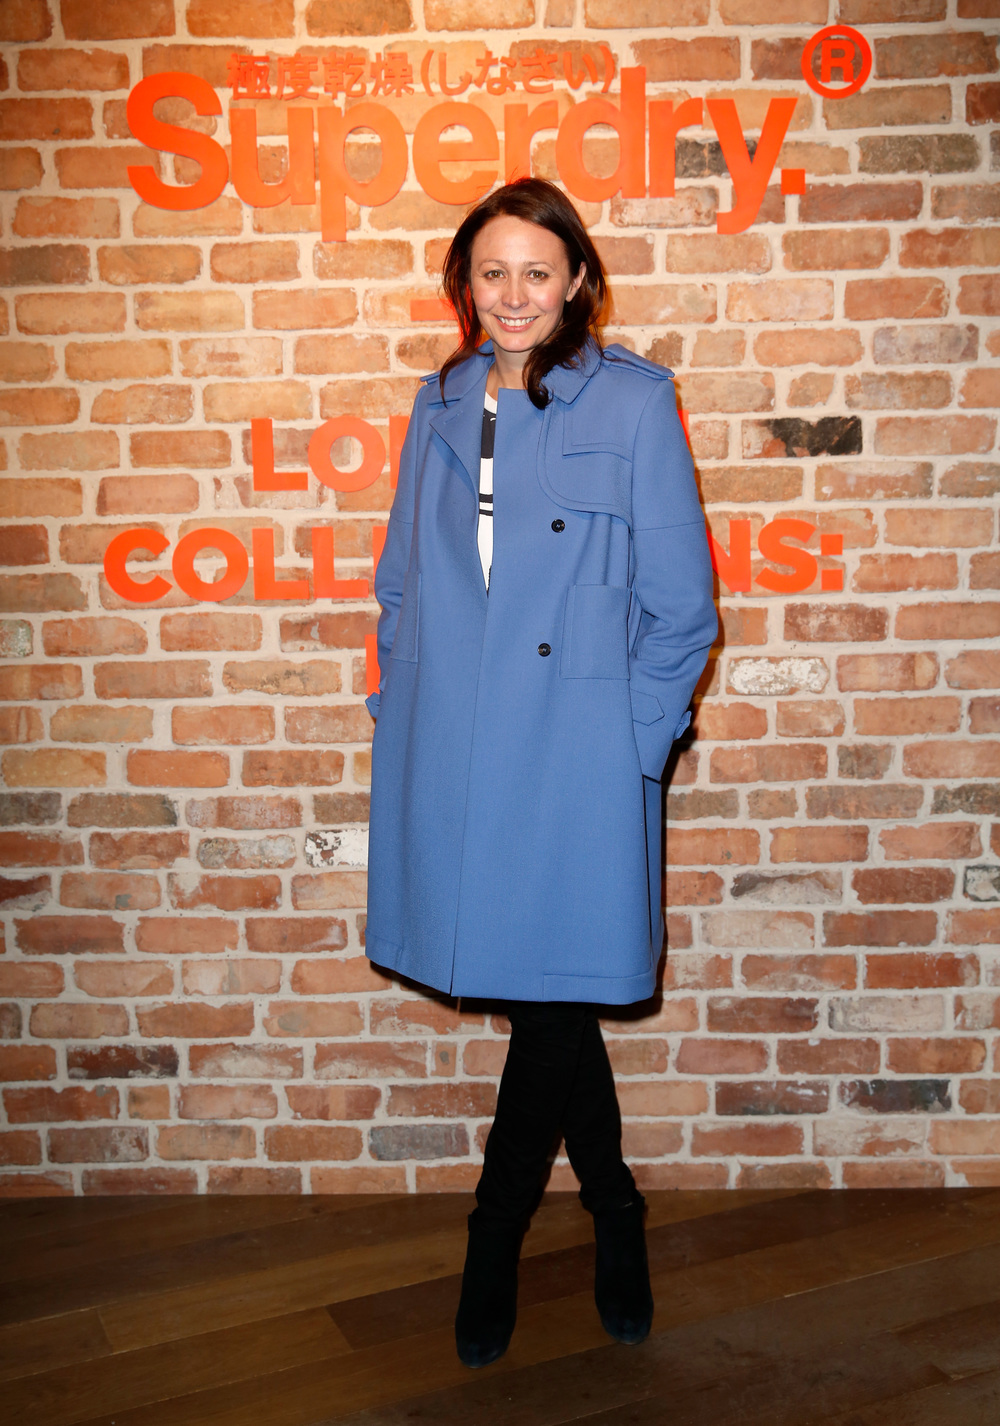 Caroline Rush, Chief Executive of the British Fashion Council